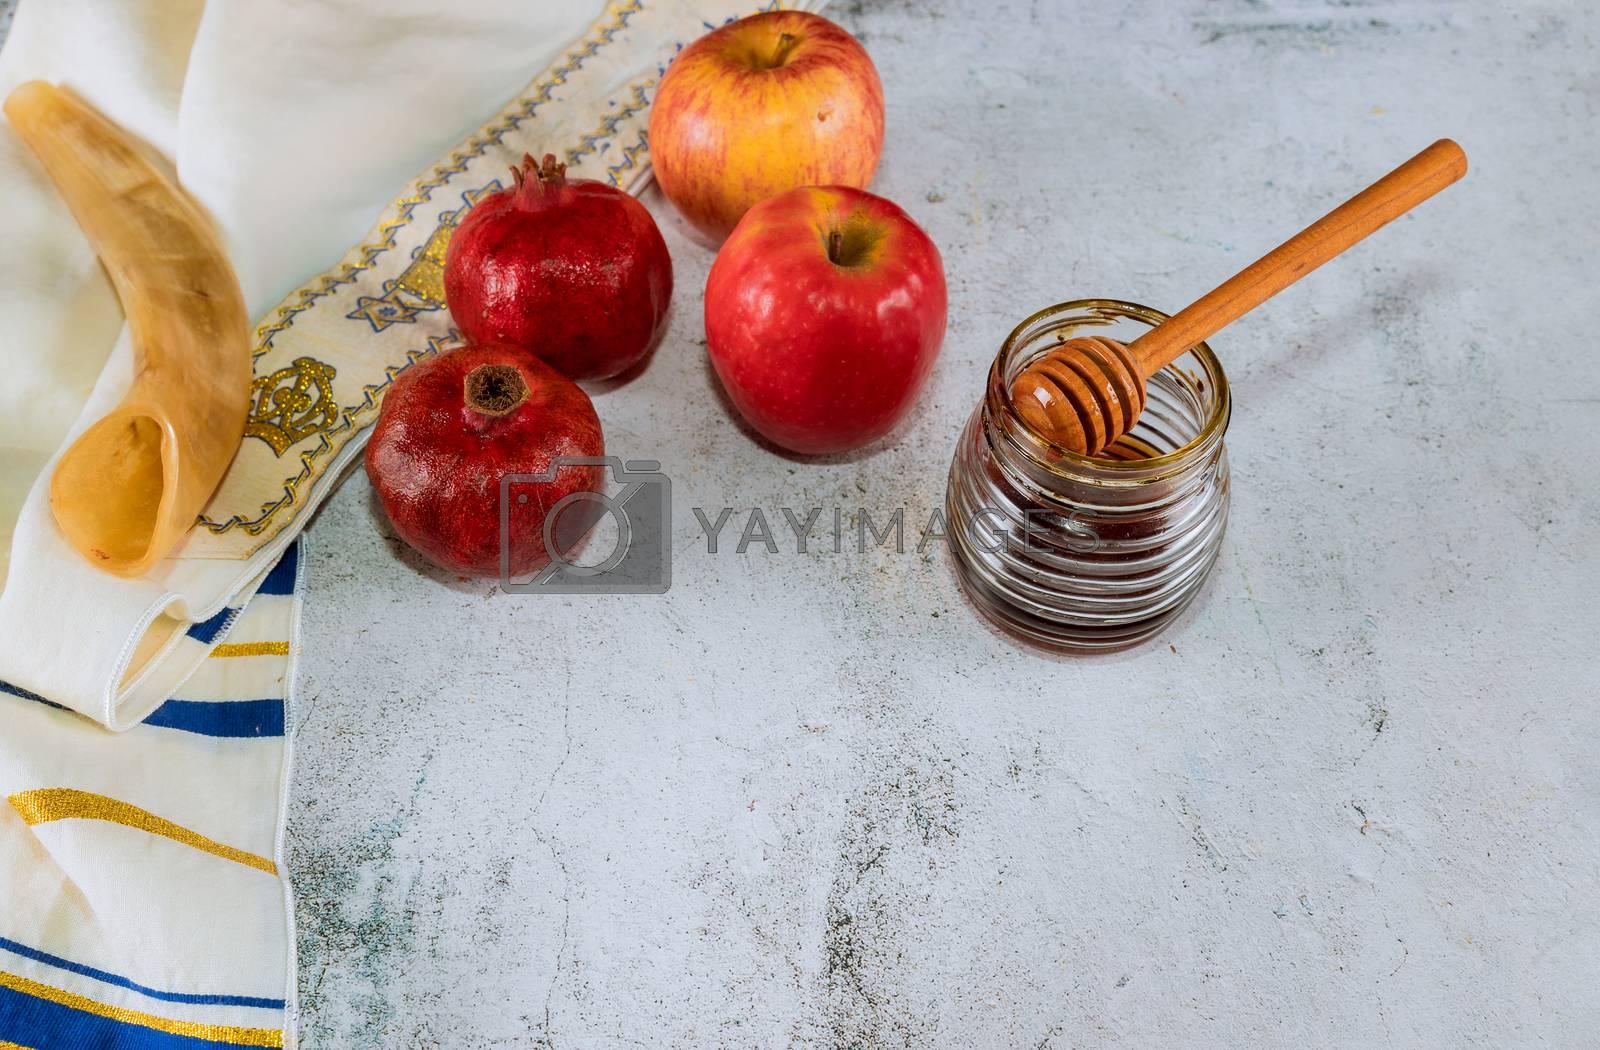 Honey on the pomegranate and apples. Jewish new year Rosh Ha Shana kippah yamolka and shofar Orthodox Jewish prays